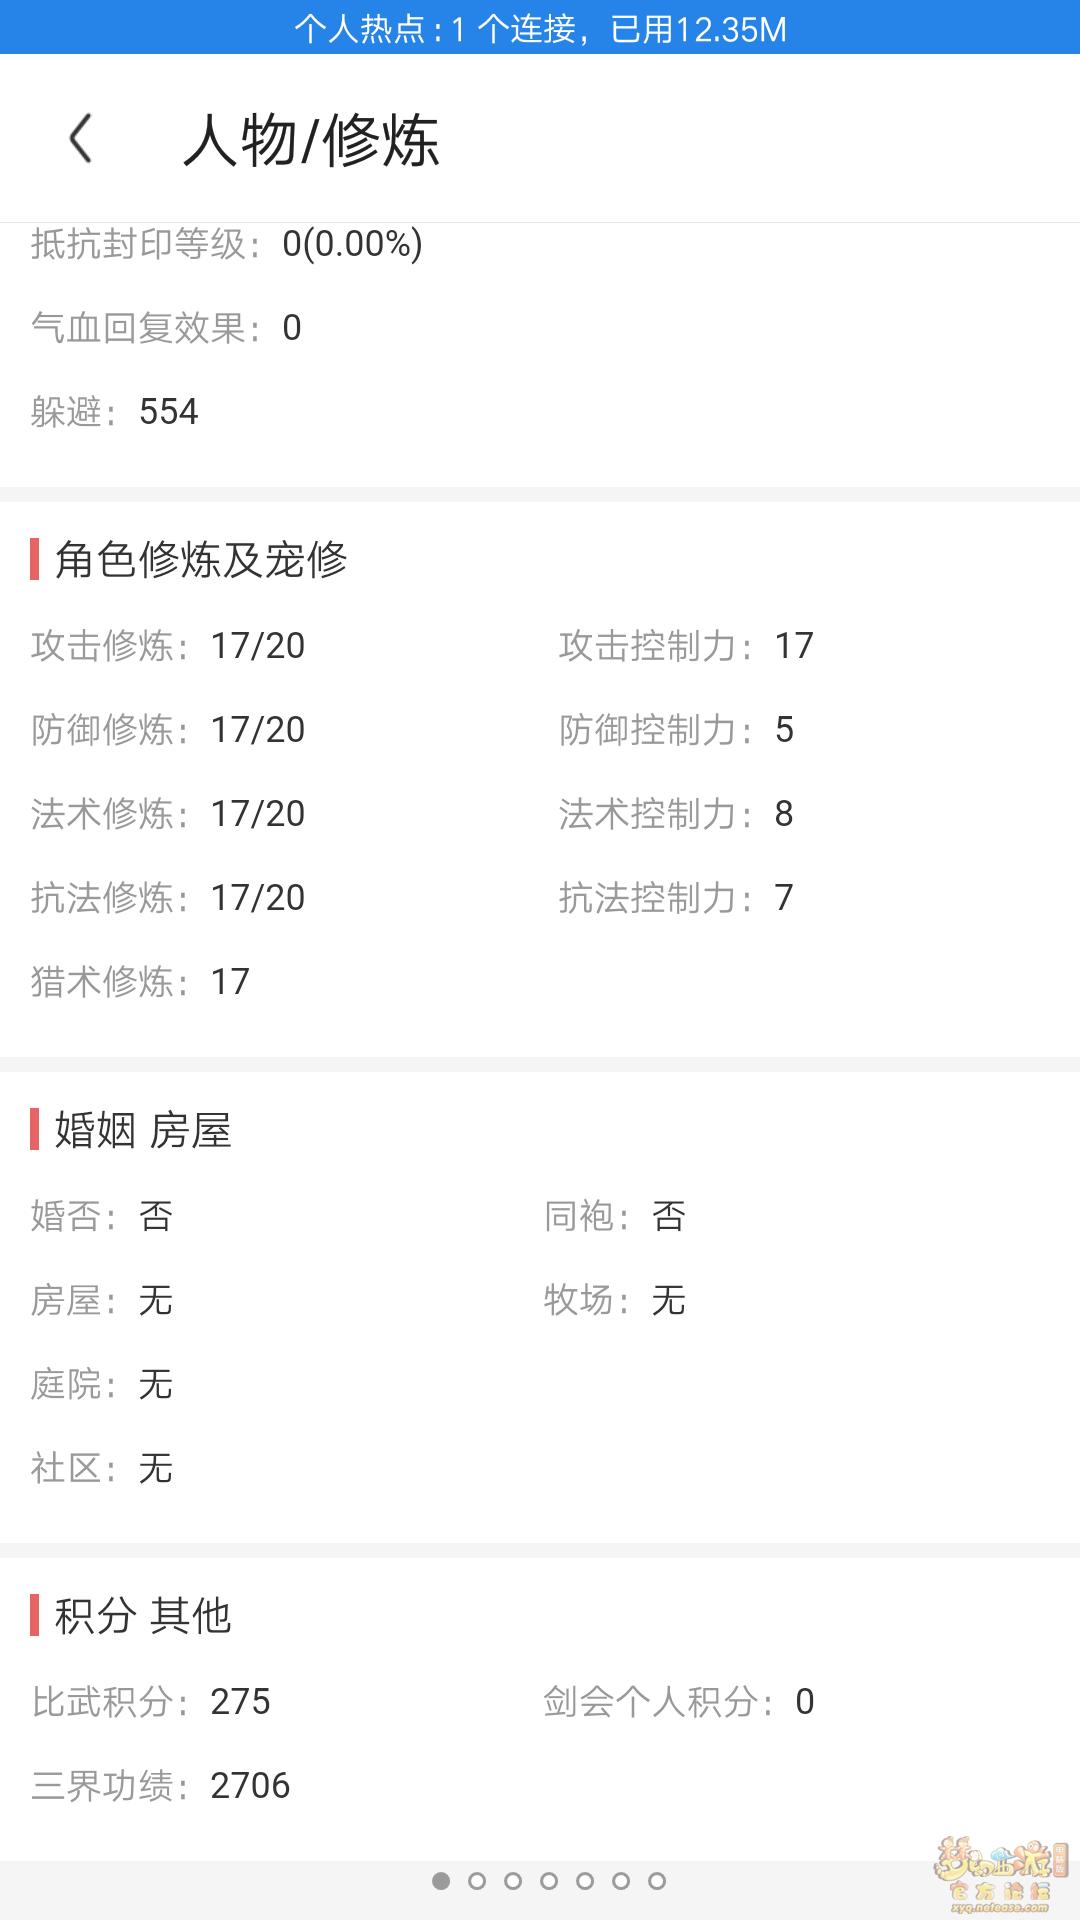 Screenshot_2020-01-20-21-34-03-62.png